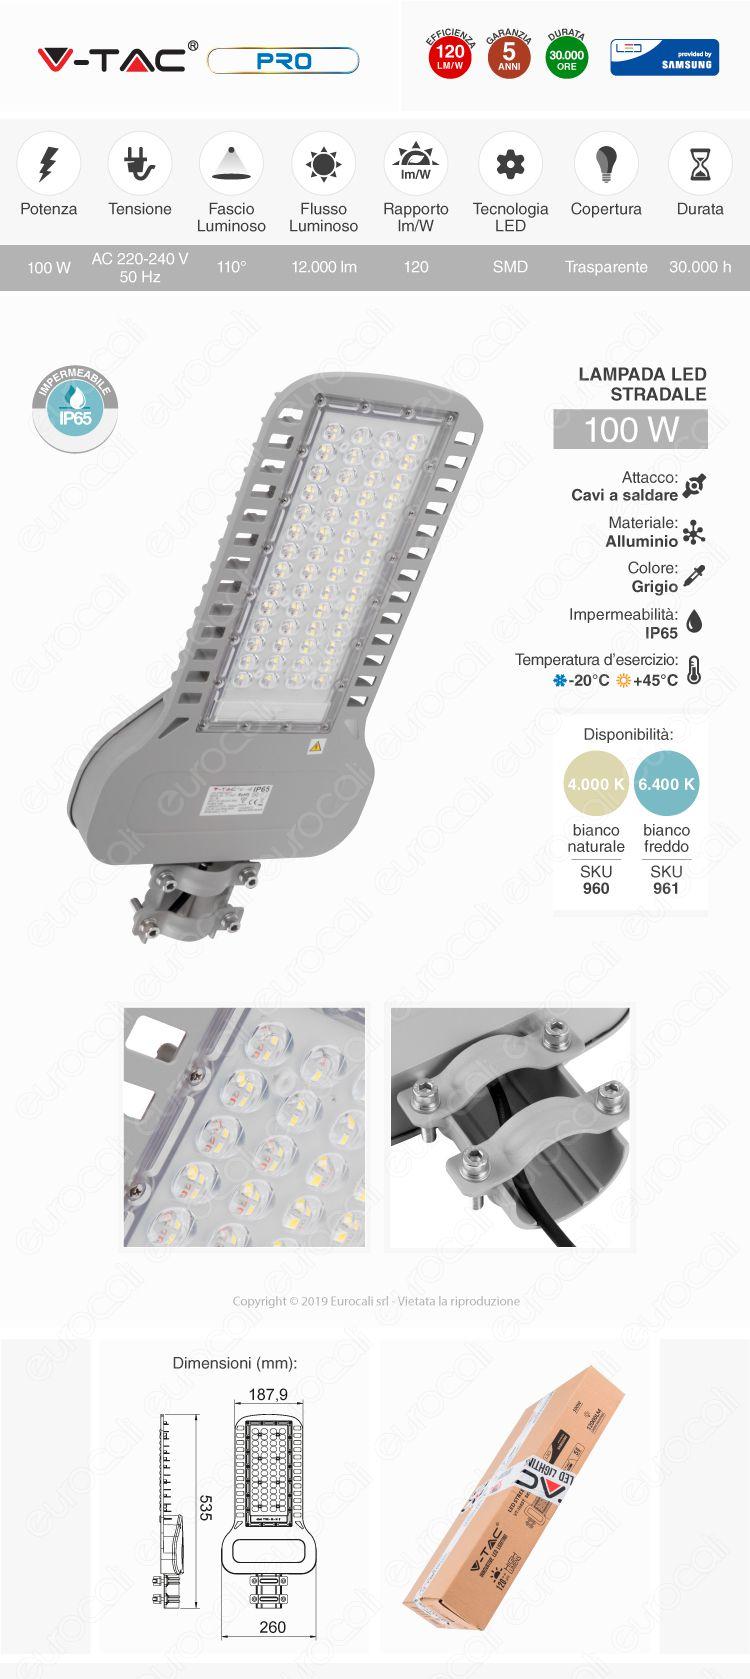 V-Tac PRO VT-104ST Lampada Stradale LED 100W Lampione SMD Chip Samsung